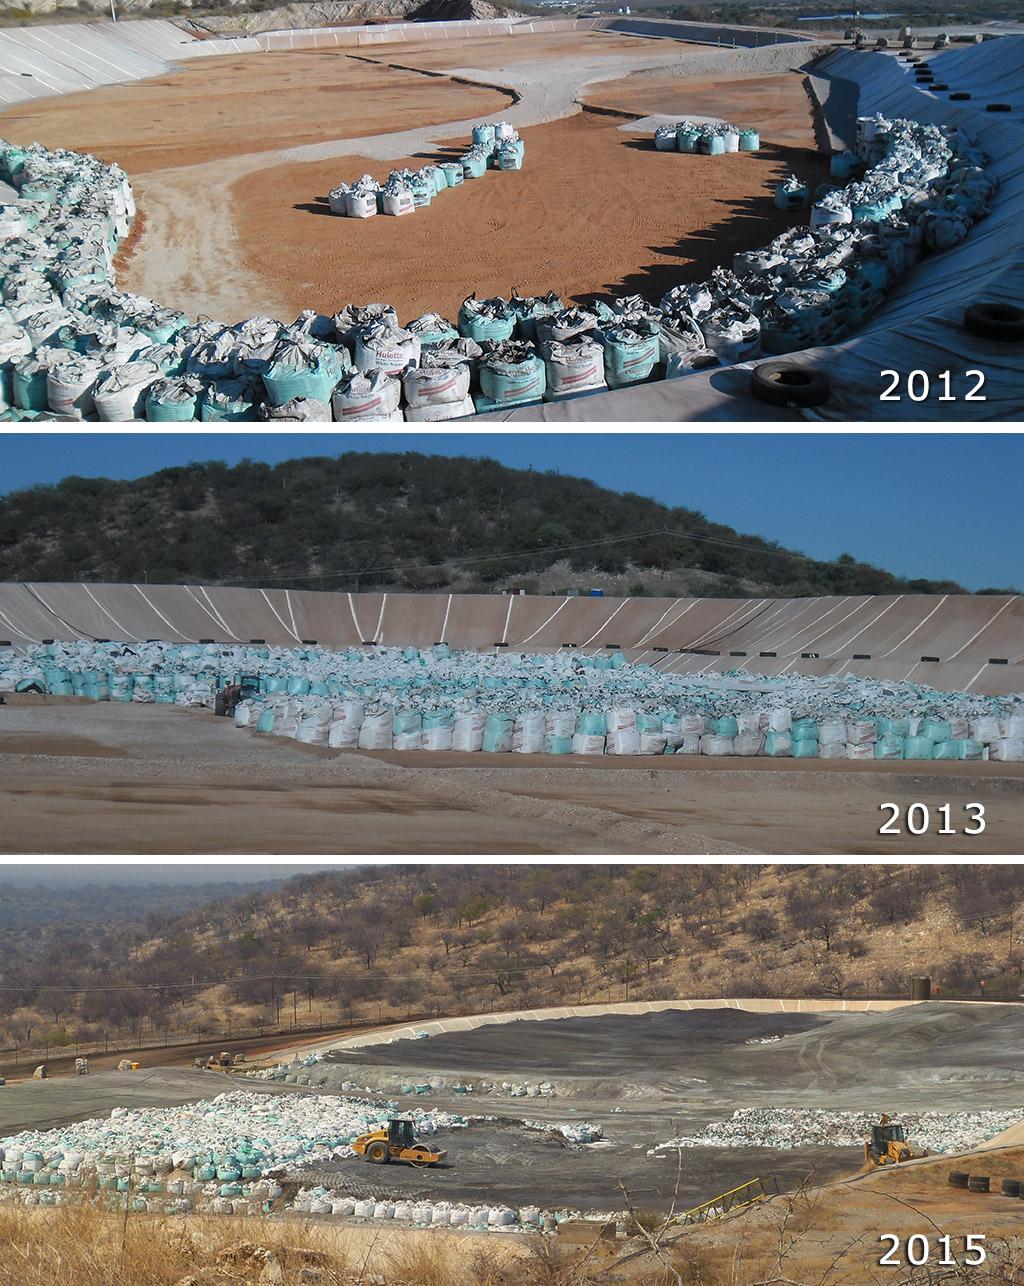 Tsumeb-waste-dump-timeline